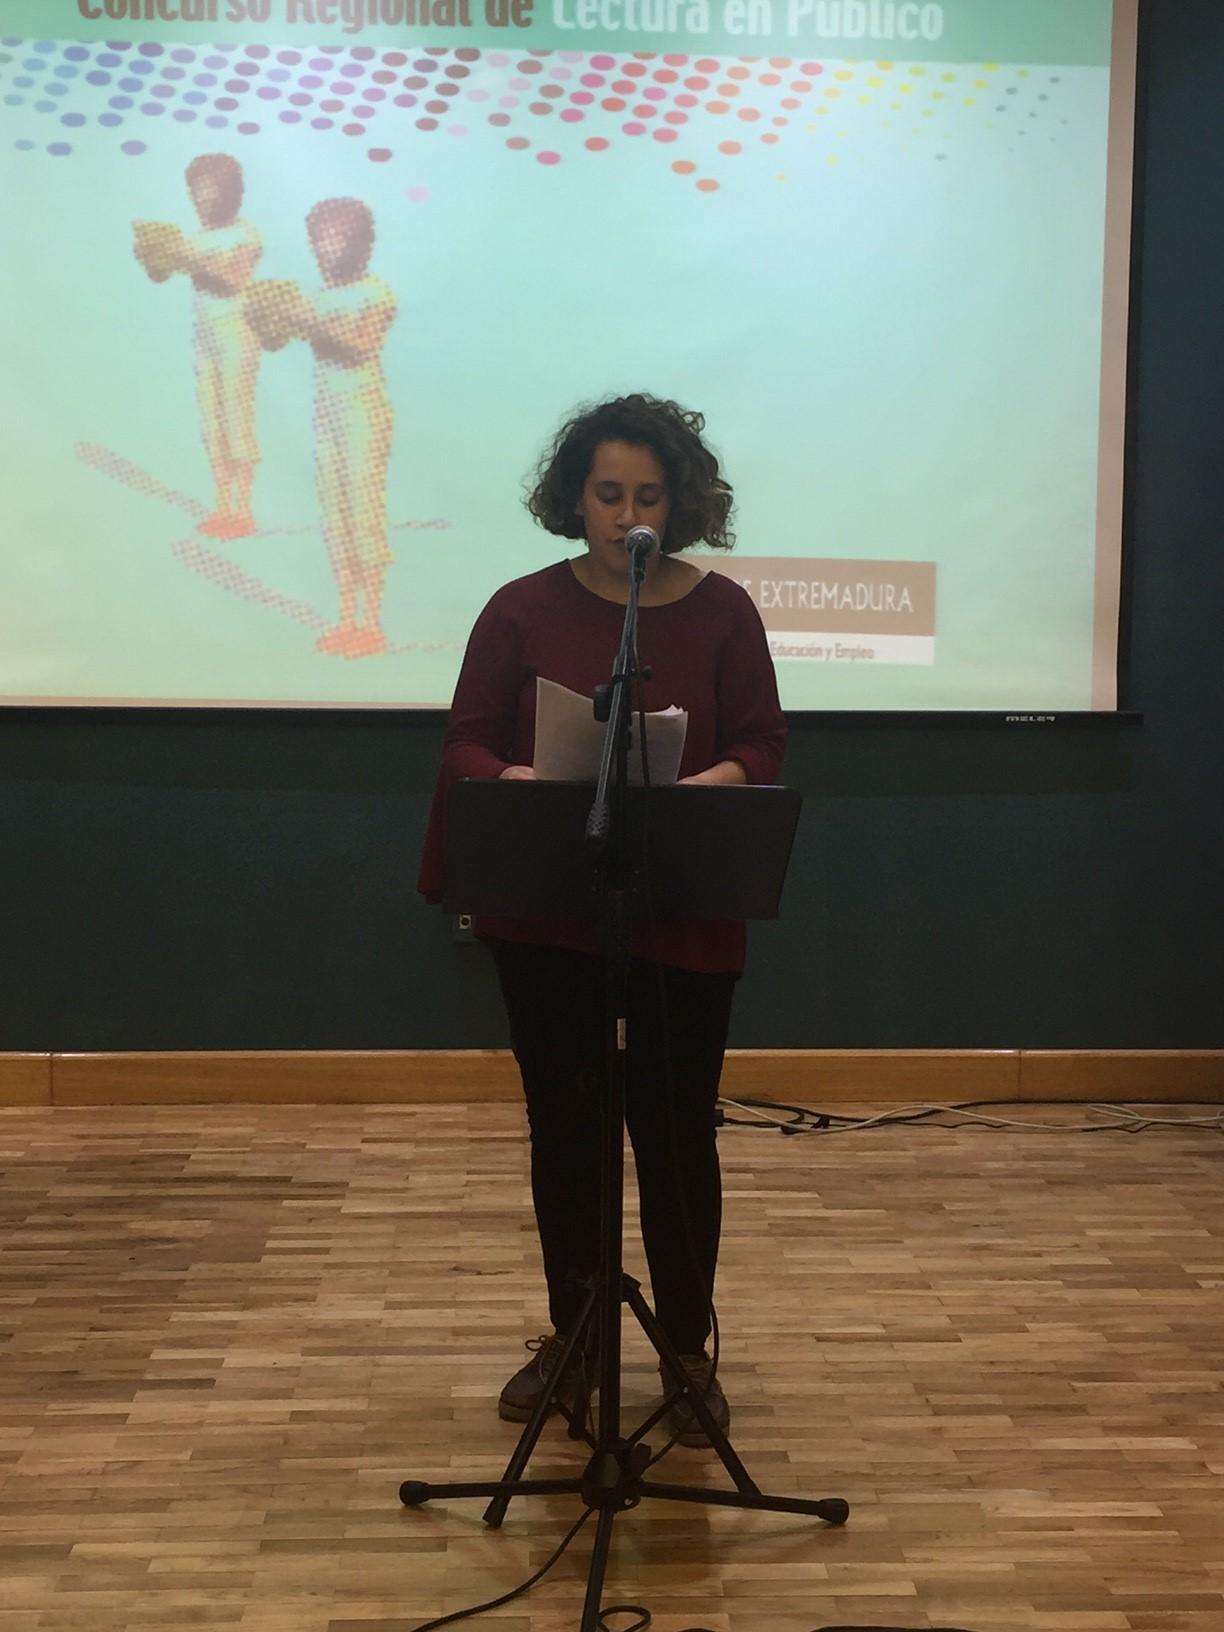 Lorena Murciano Fernández IES Llerena de Llerena